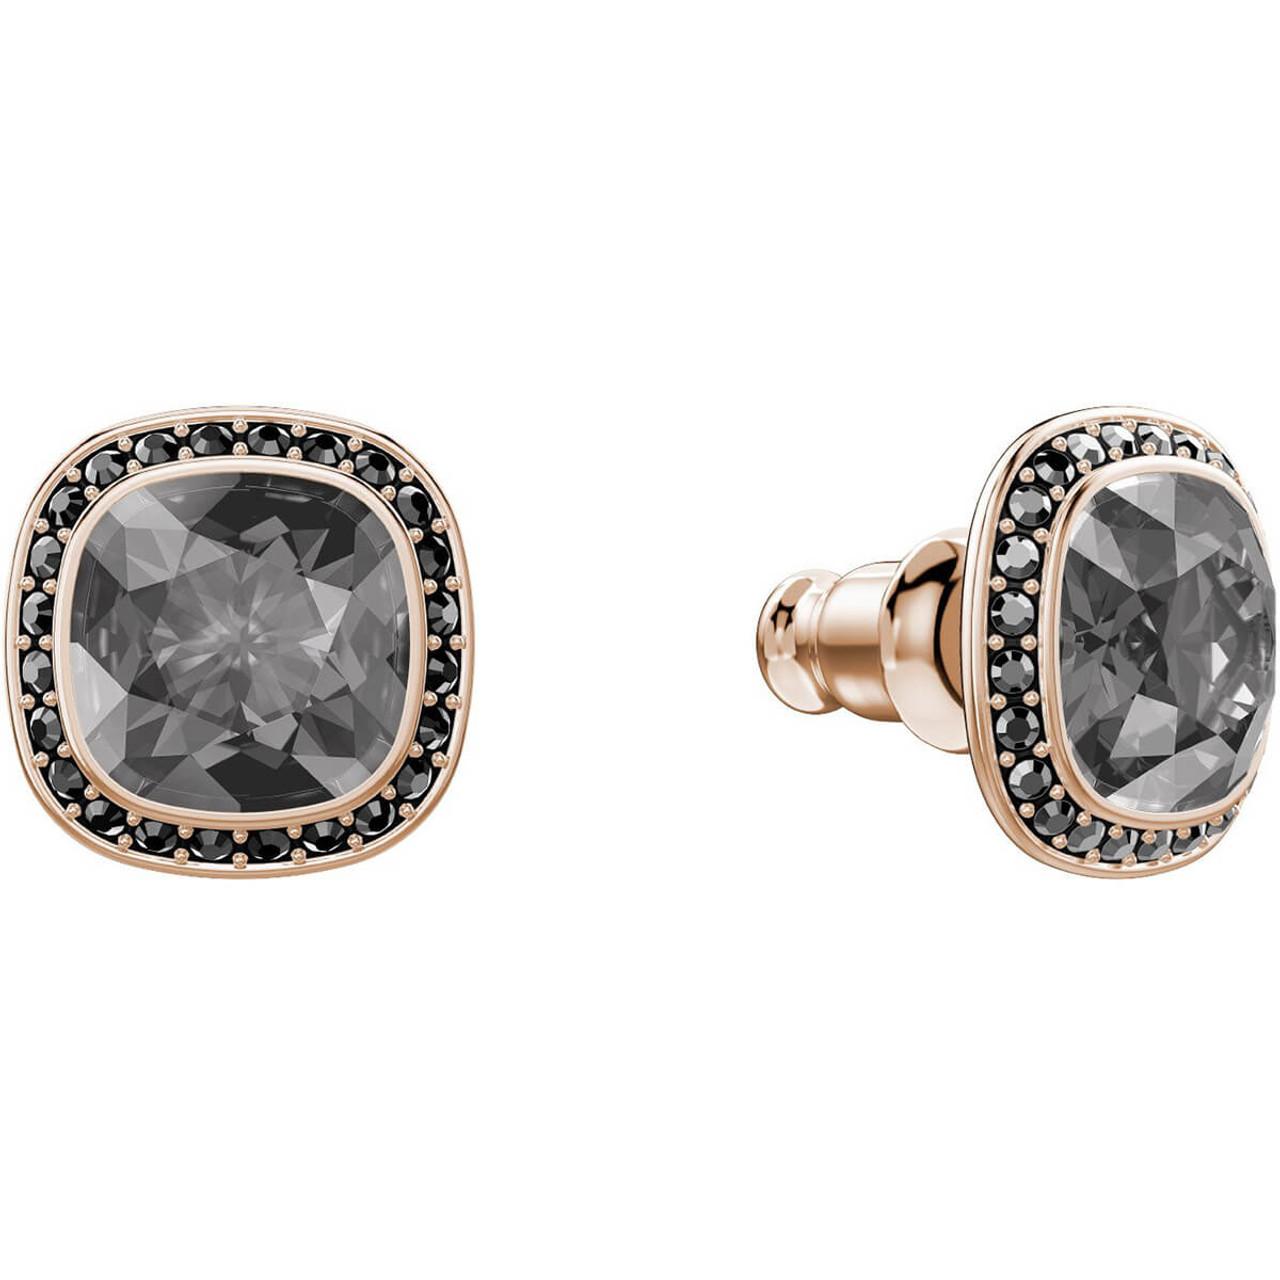 swarovski-latitude-black-crystal-rose-gold-stud-earrings -5430357  45600.1547132809.jpg c 2 imbypass on 09f5d5700b